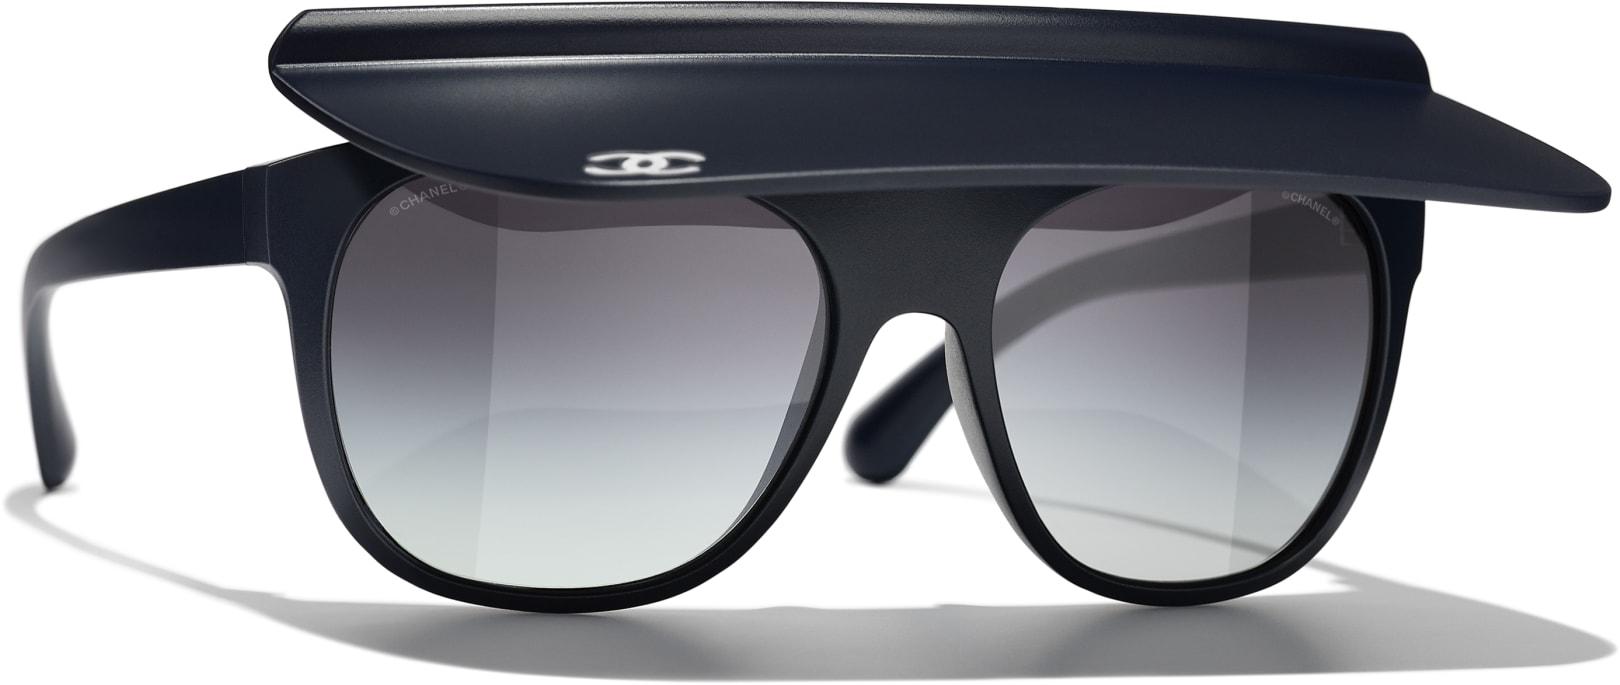 Visor Sunglasses